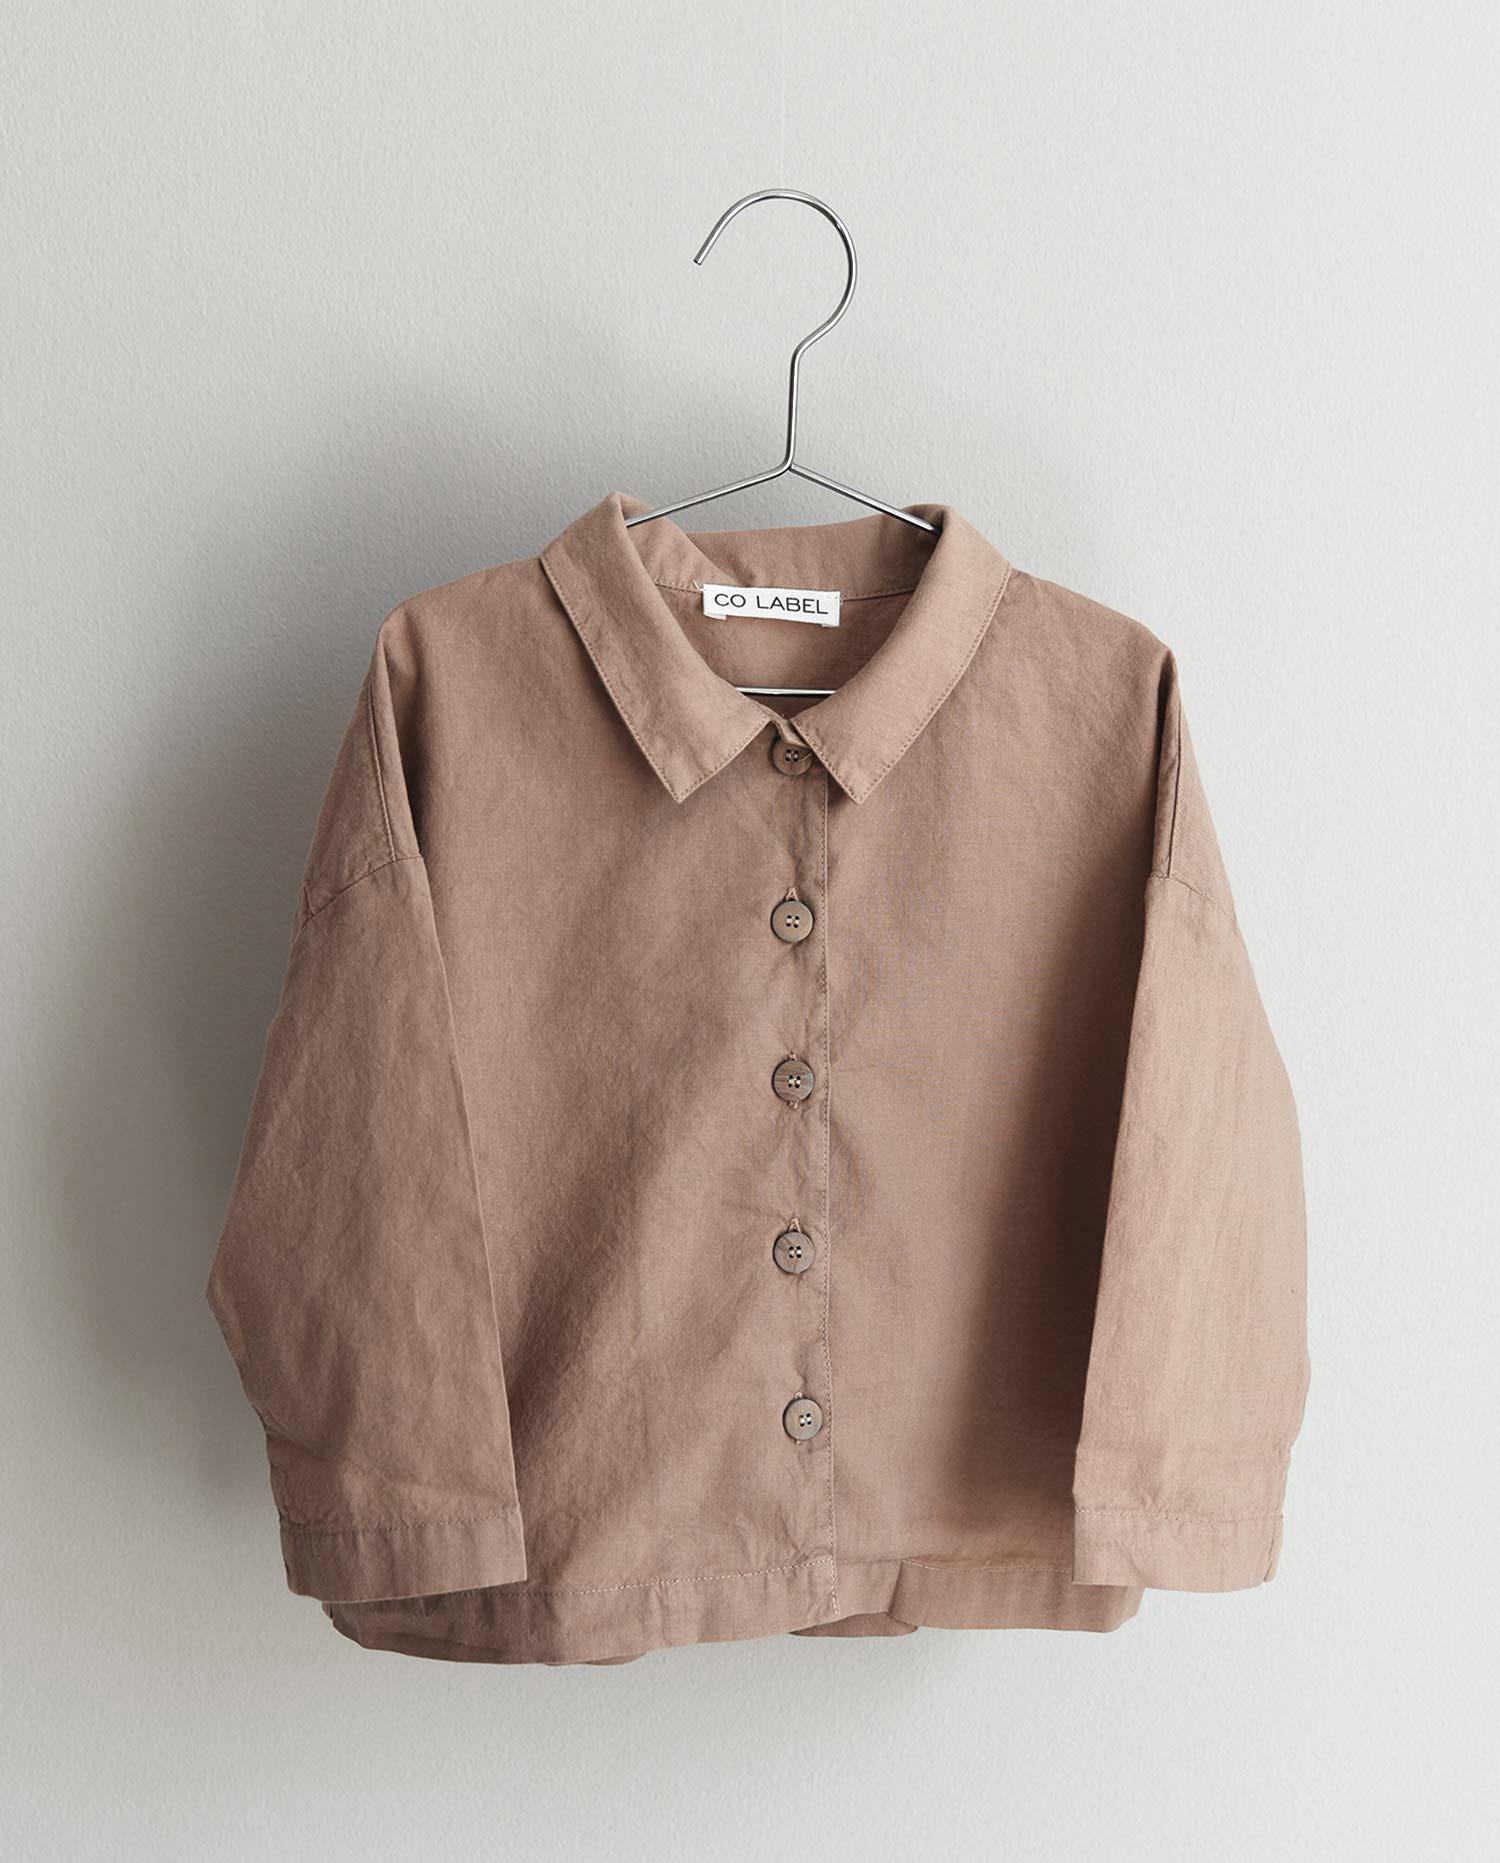 CO LABEL Bo shirt - Mushroom -